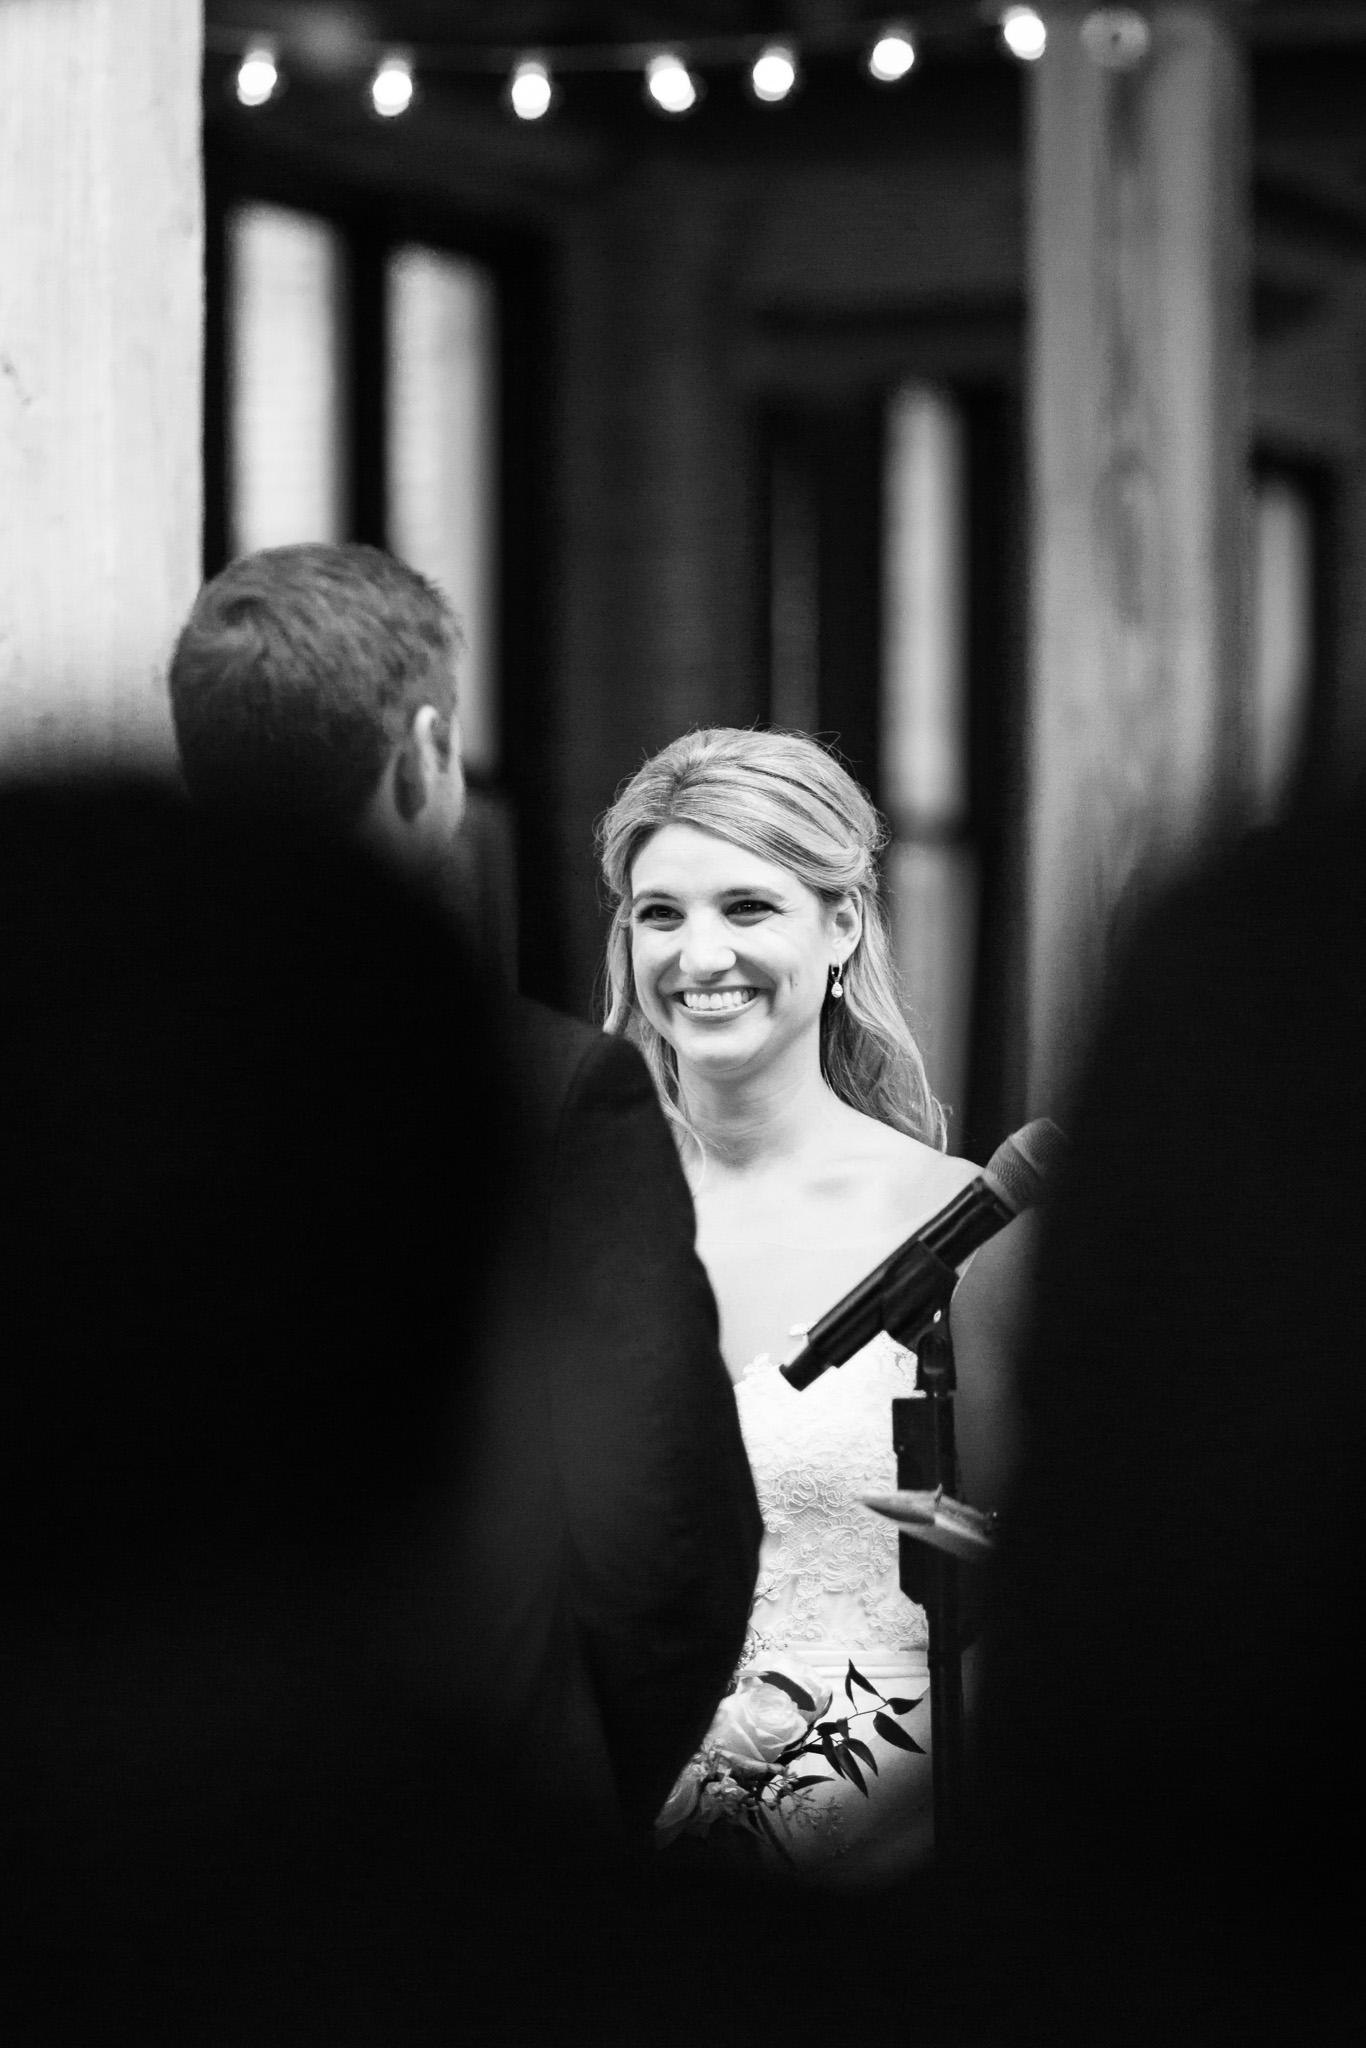 bridgeport-art-center-wedding-photos-22.jpg